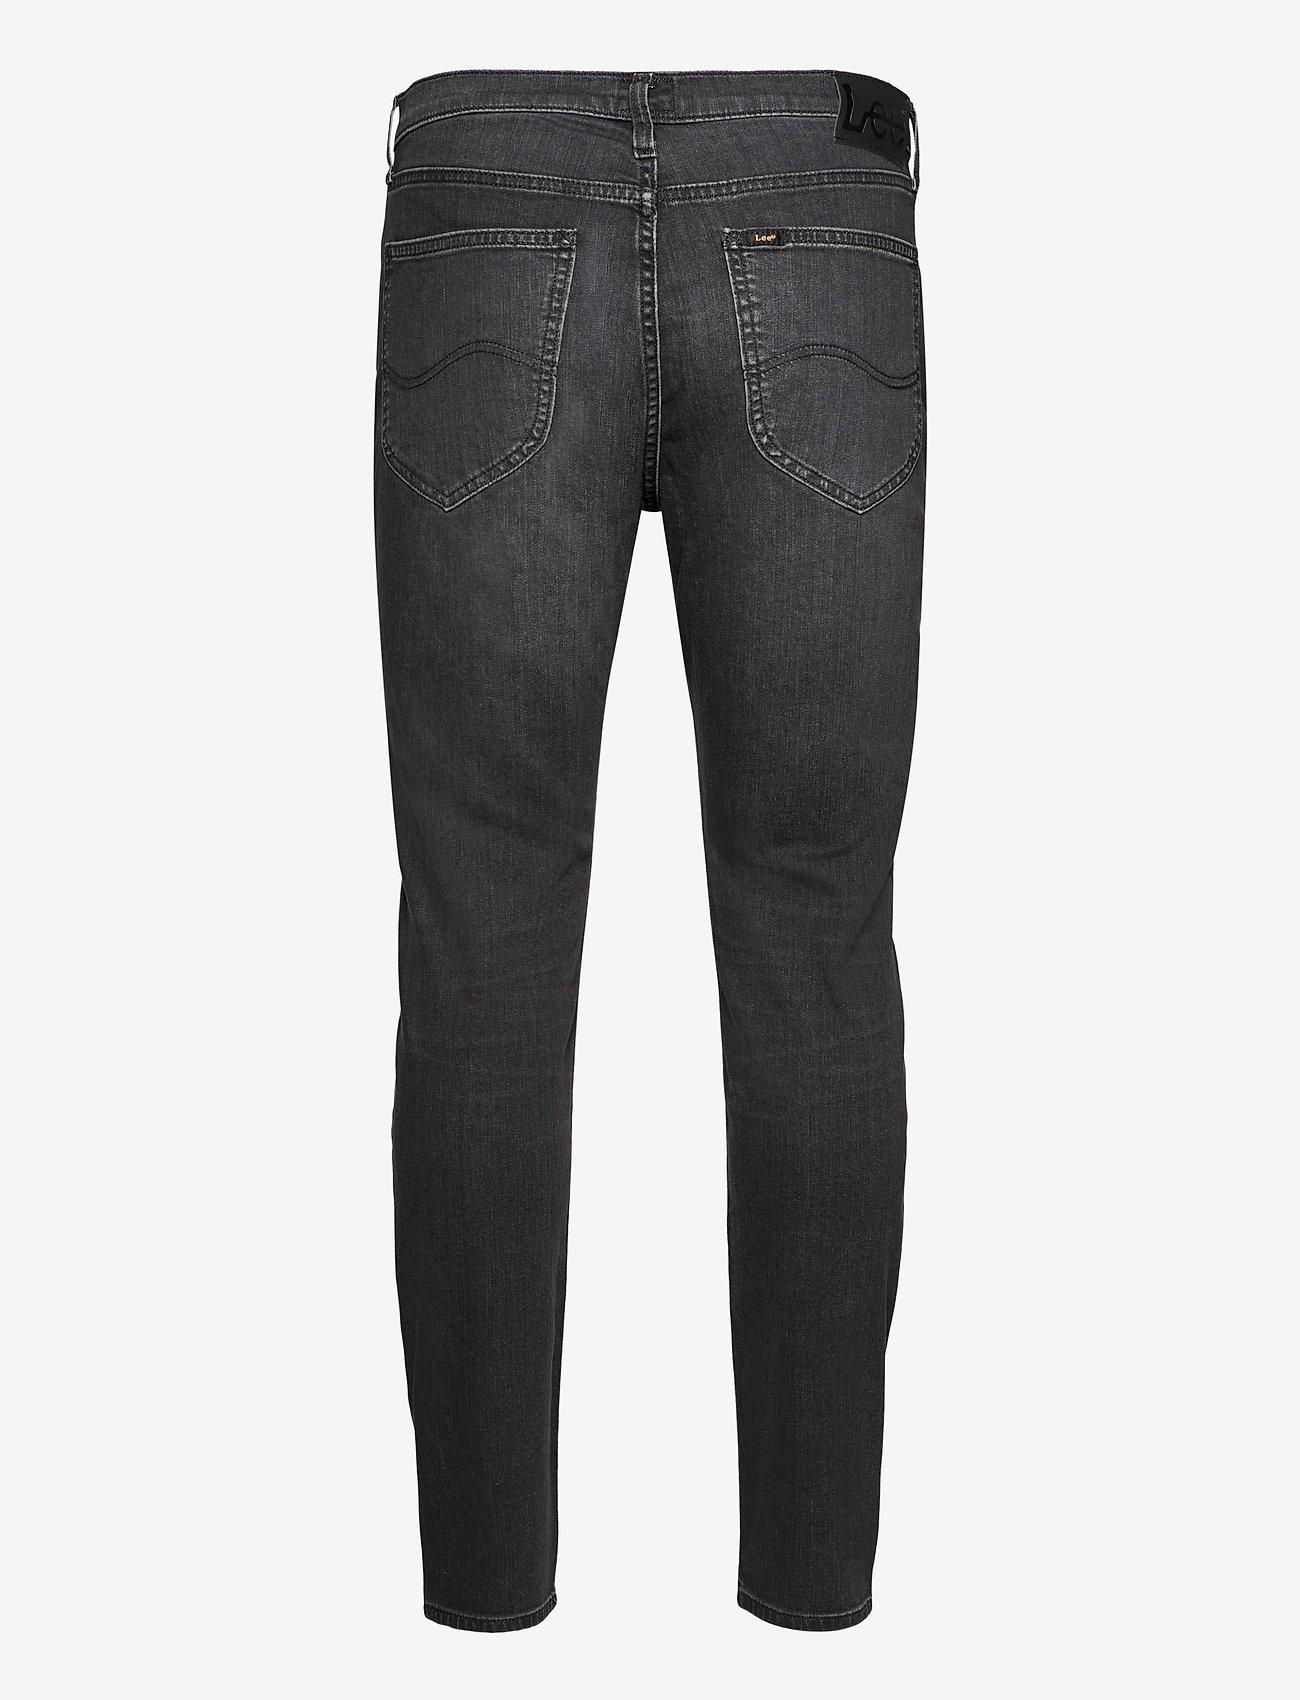 Lee Jeans - AUSTIN - tapered jeans - dark crosby - 1